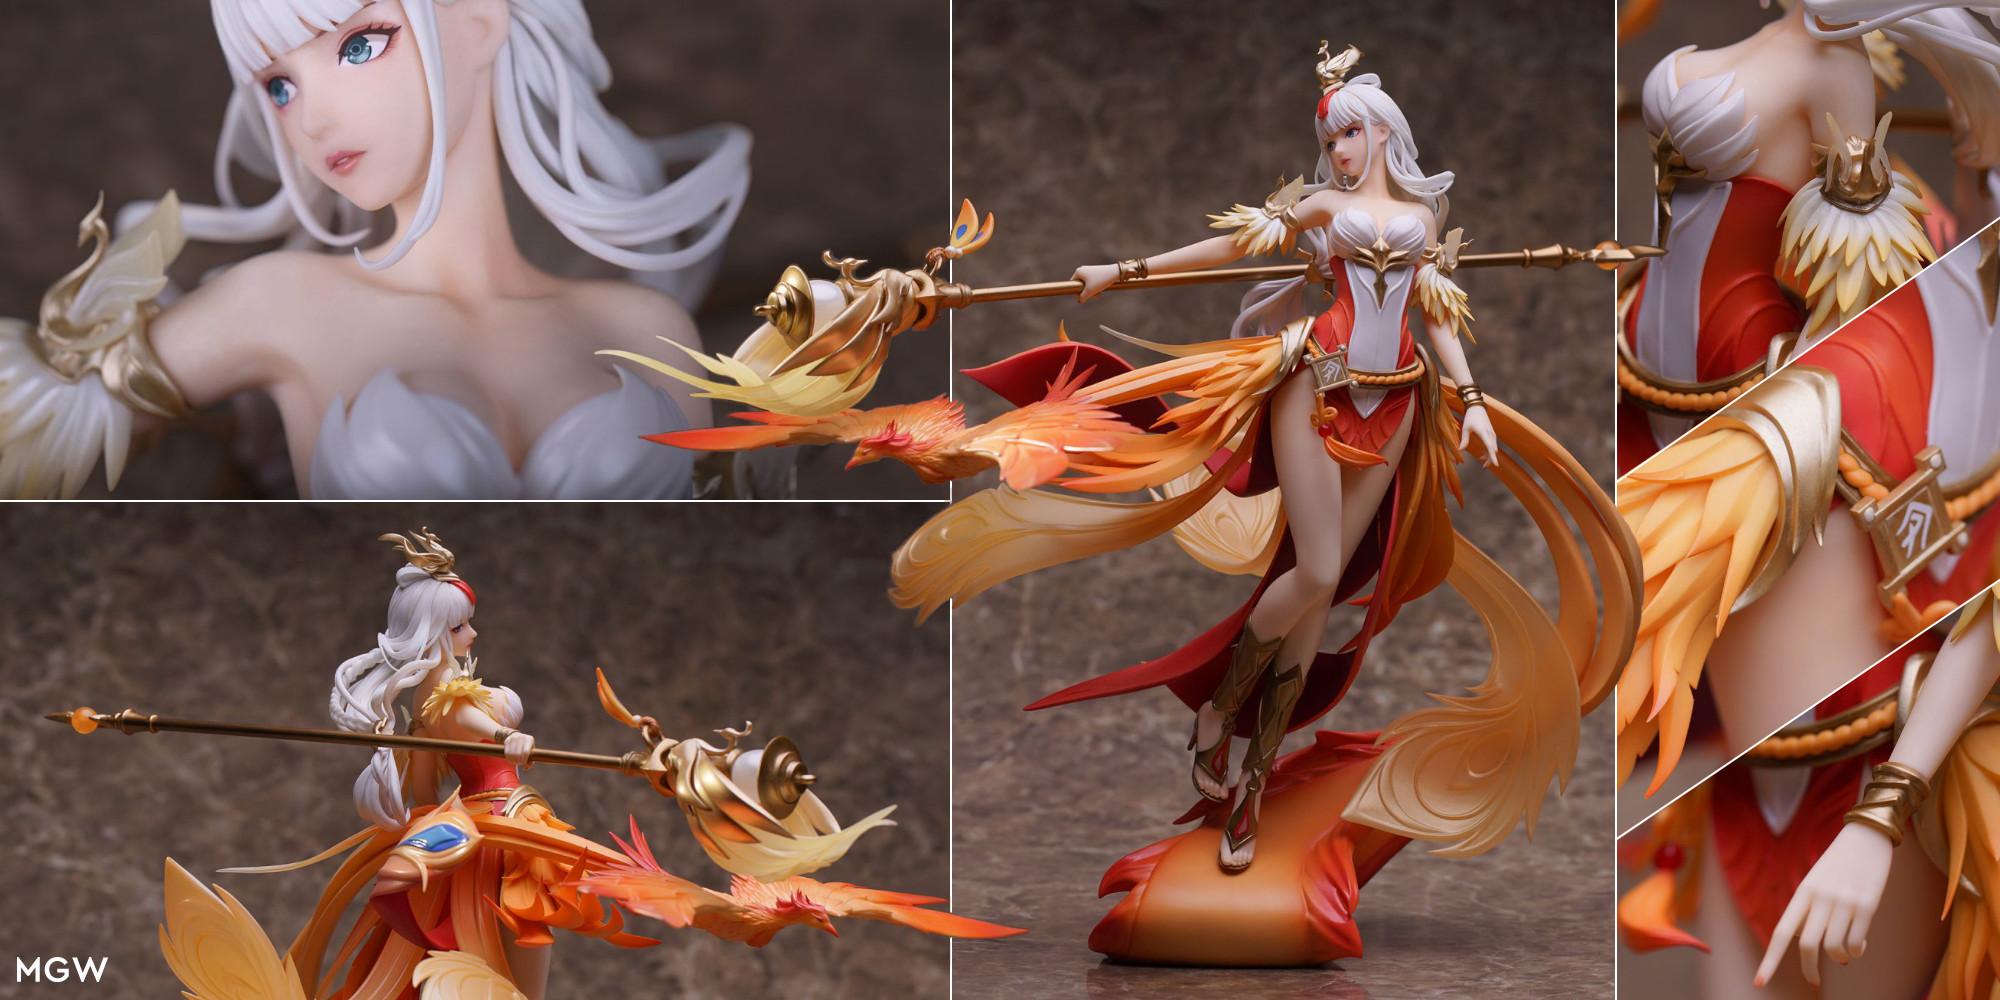 Wang Zhaojun Flying Phoenixes Ver. by Myethos from King of Glory